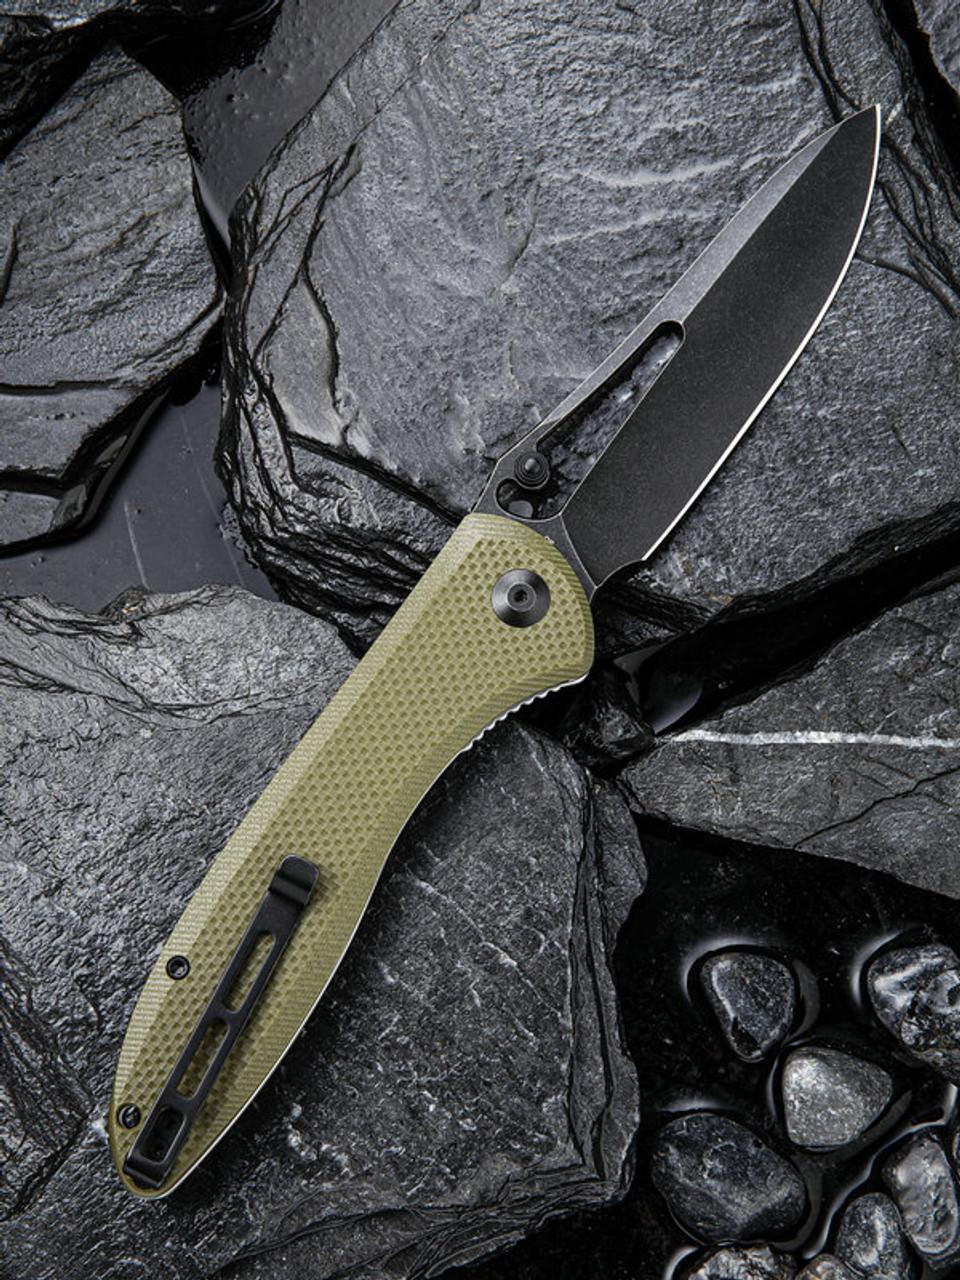 "Civivi Picaro Linerlock Folder C916A, 3.94"" D2 Black Stonewash Drop Point Plain Blade, Green G-10 Handle"